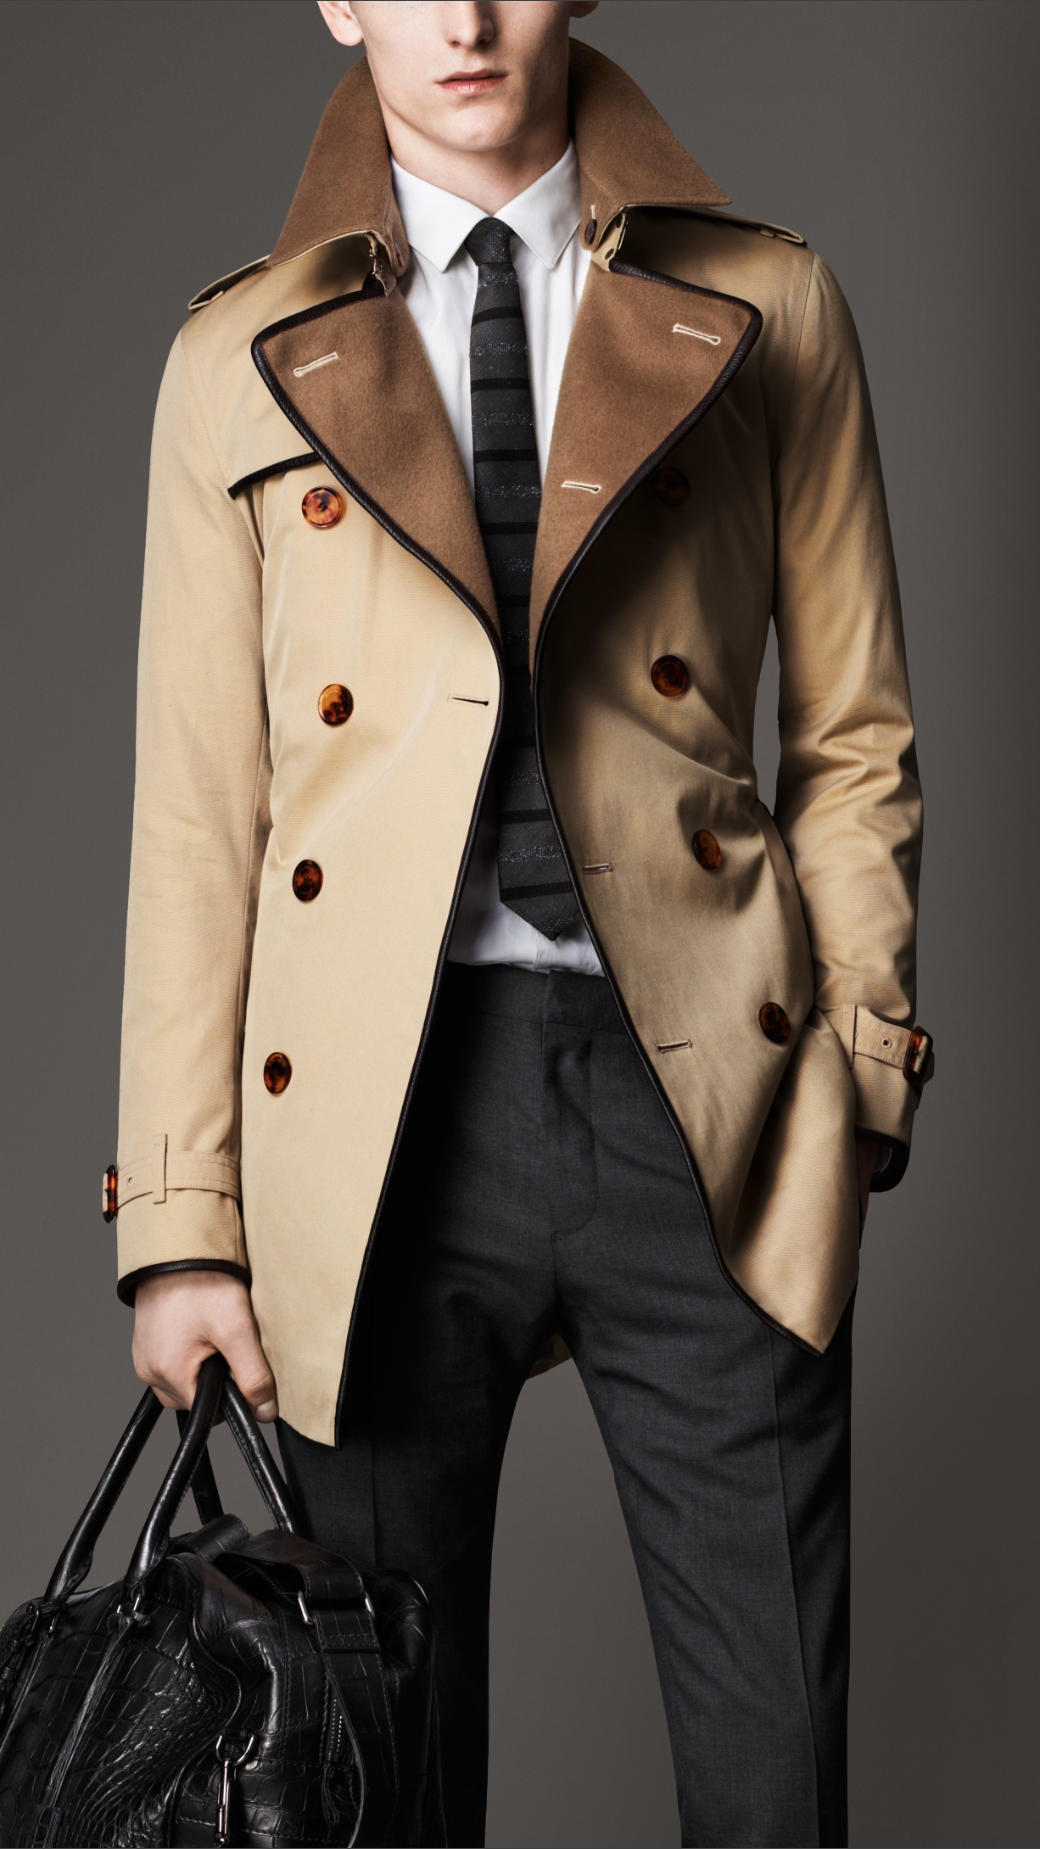 Trench coat homens 4